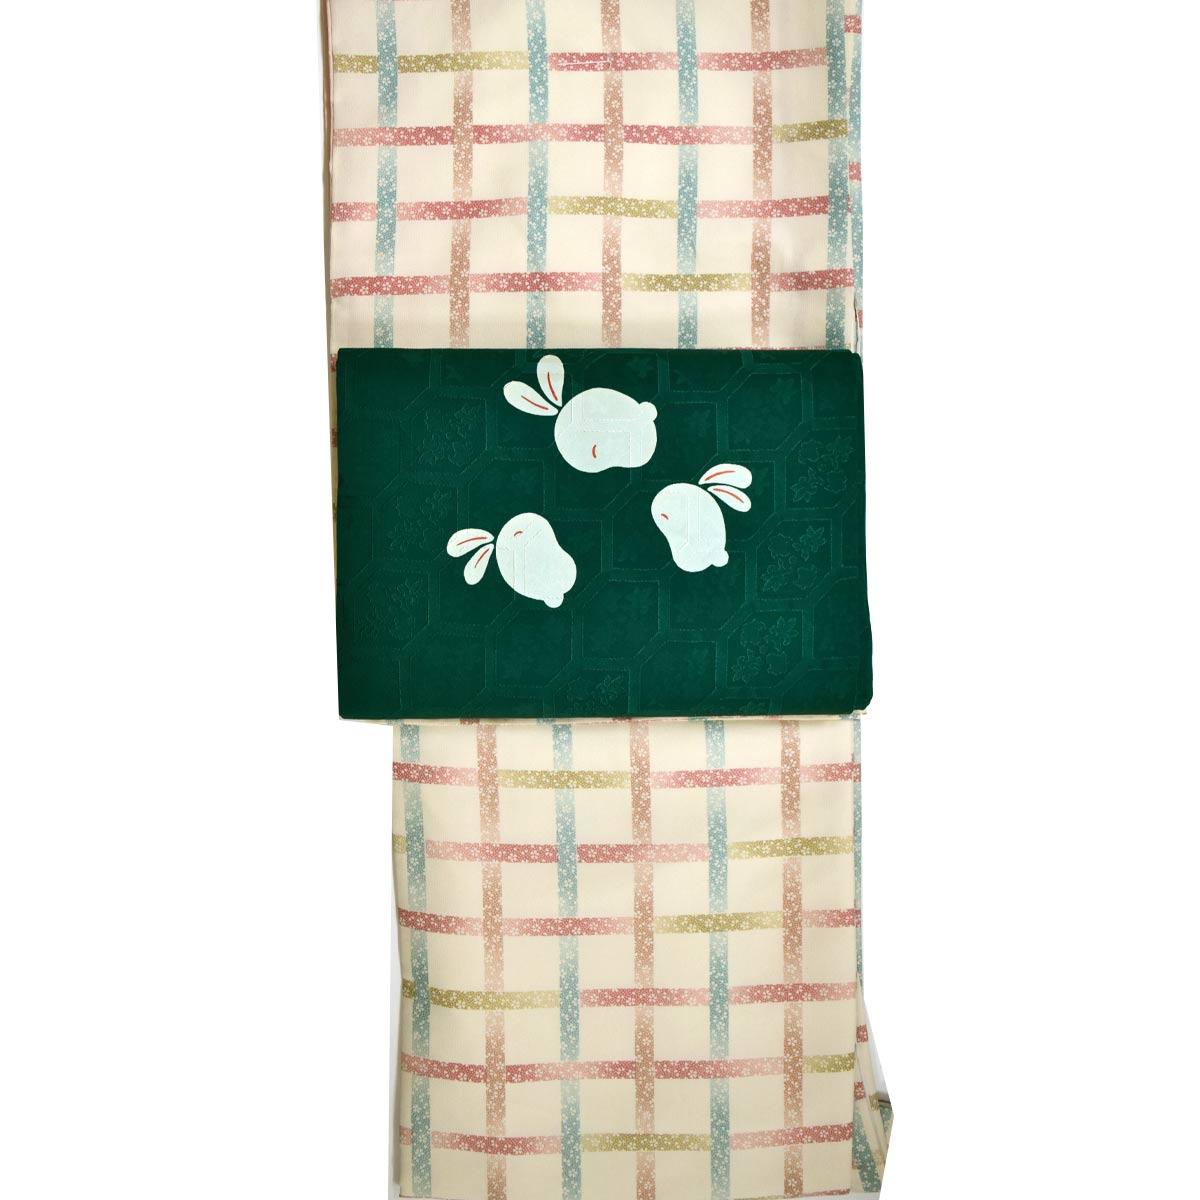 【M寸】洗える 袷 着物セット【2点】洗える袷着物+正絹九寸名古屋帯番号d910-10 着物 和装 和服